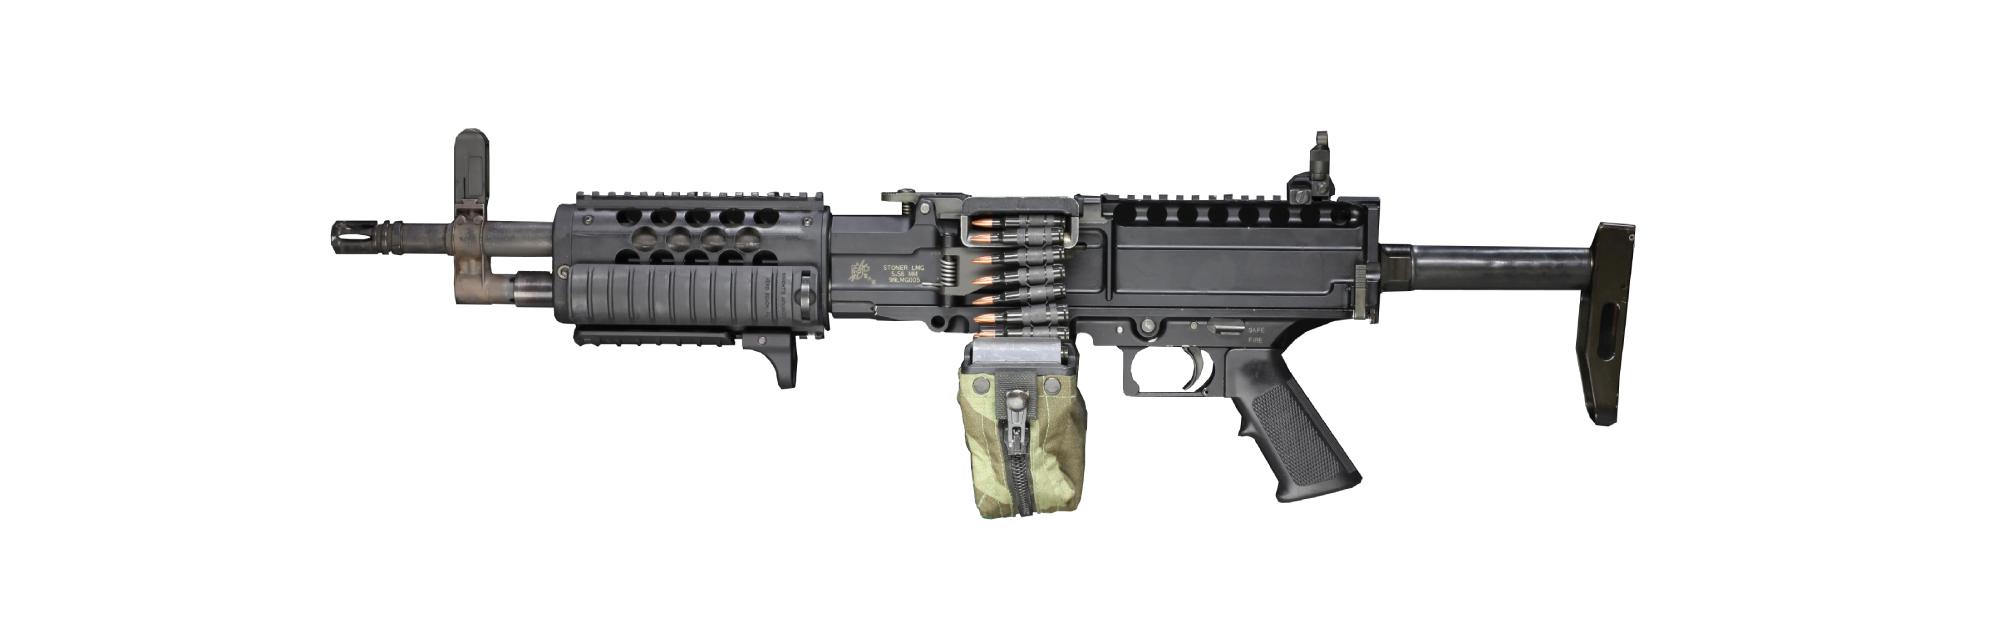 FN Minimi Mk 2 Lmg_main